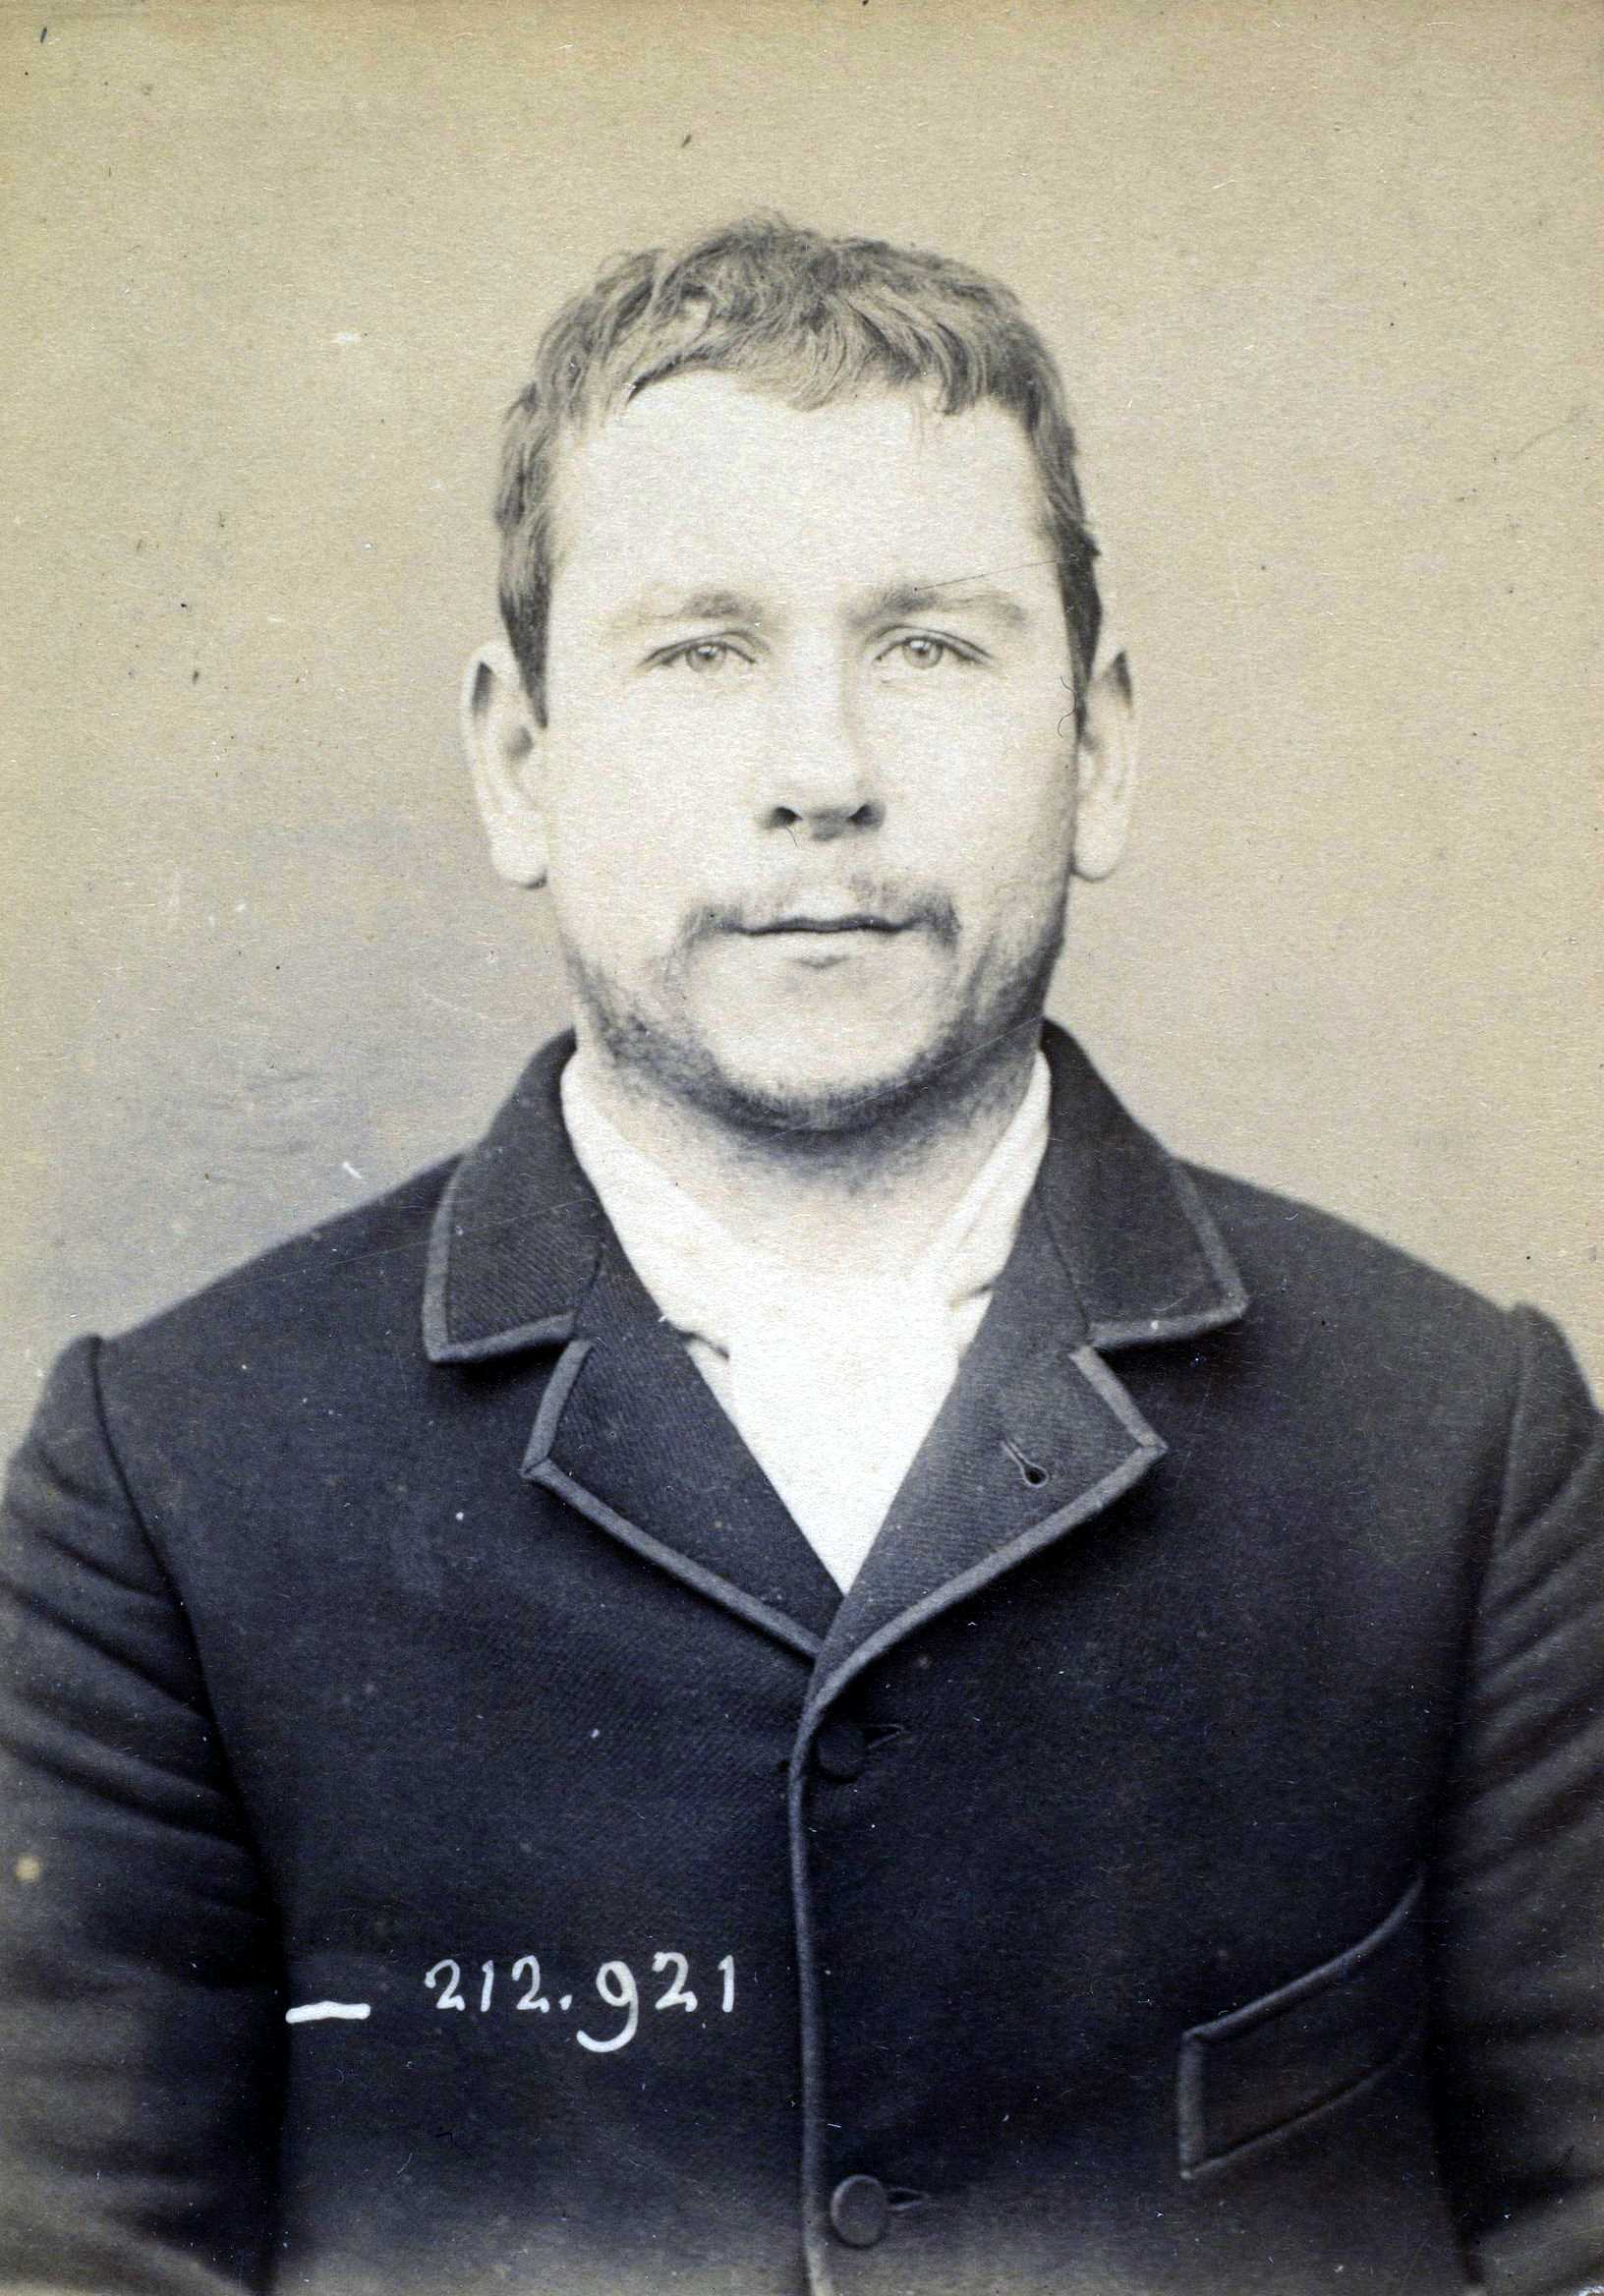 Foto policíaca d'Albert Tramcourt (ca. 1894)